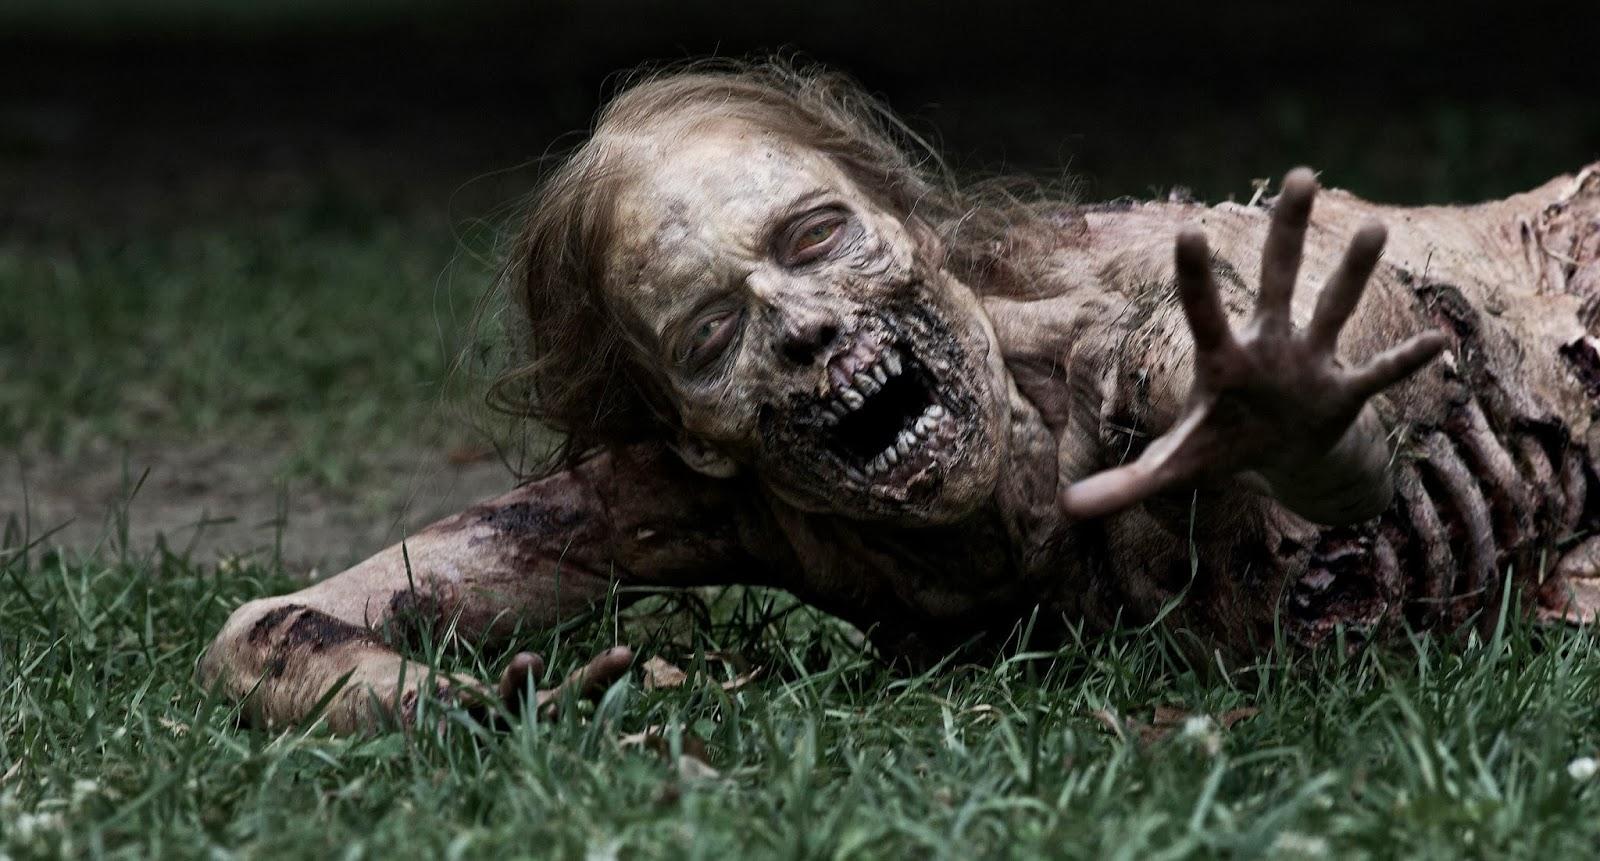 Zombie Animasi Bergerak Lucu X